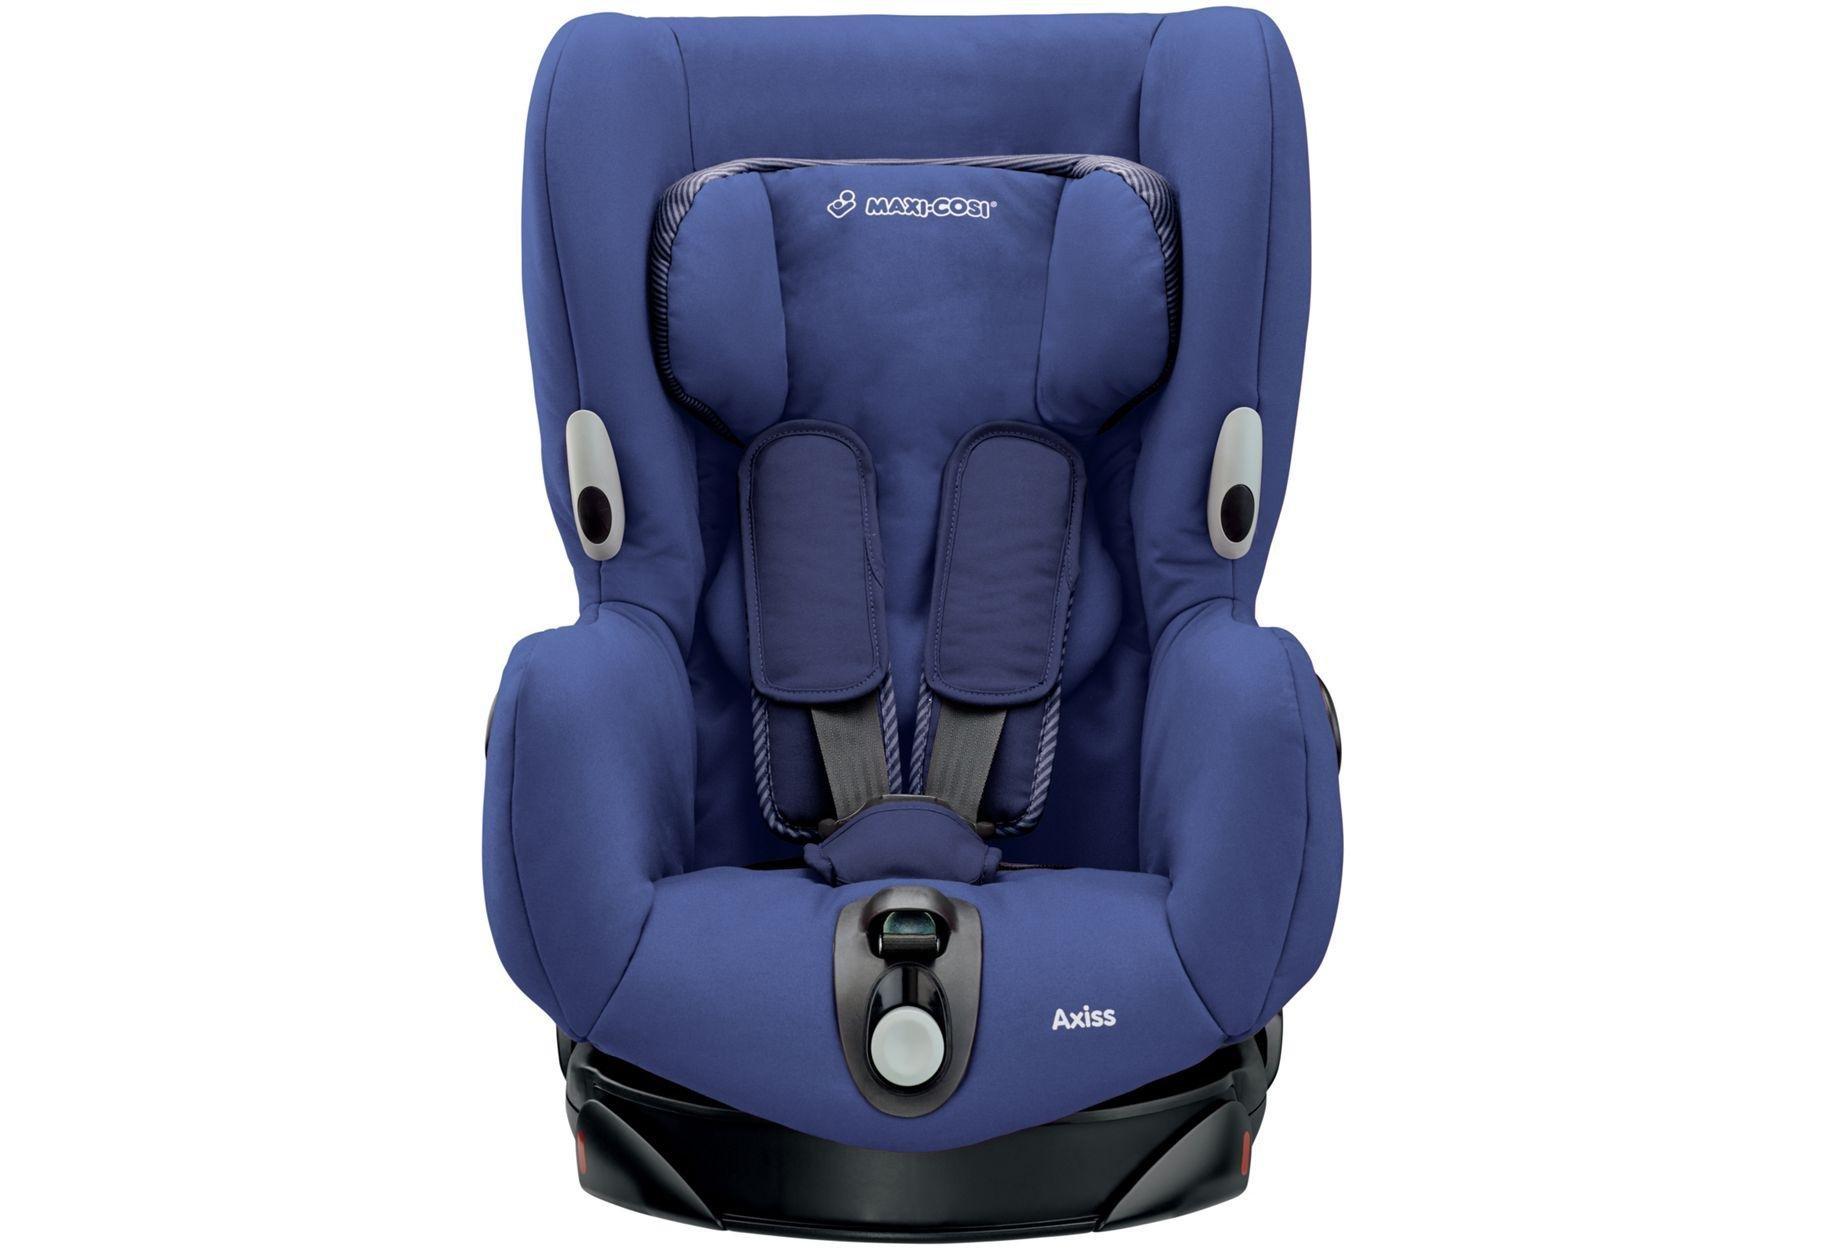 Maxi-Cosi Axiss Group 1 Car Seat - River Blue